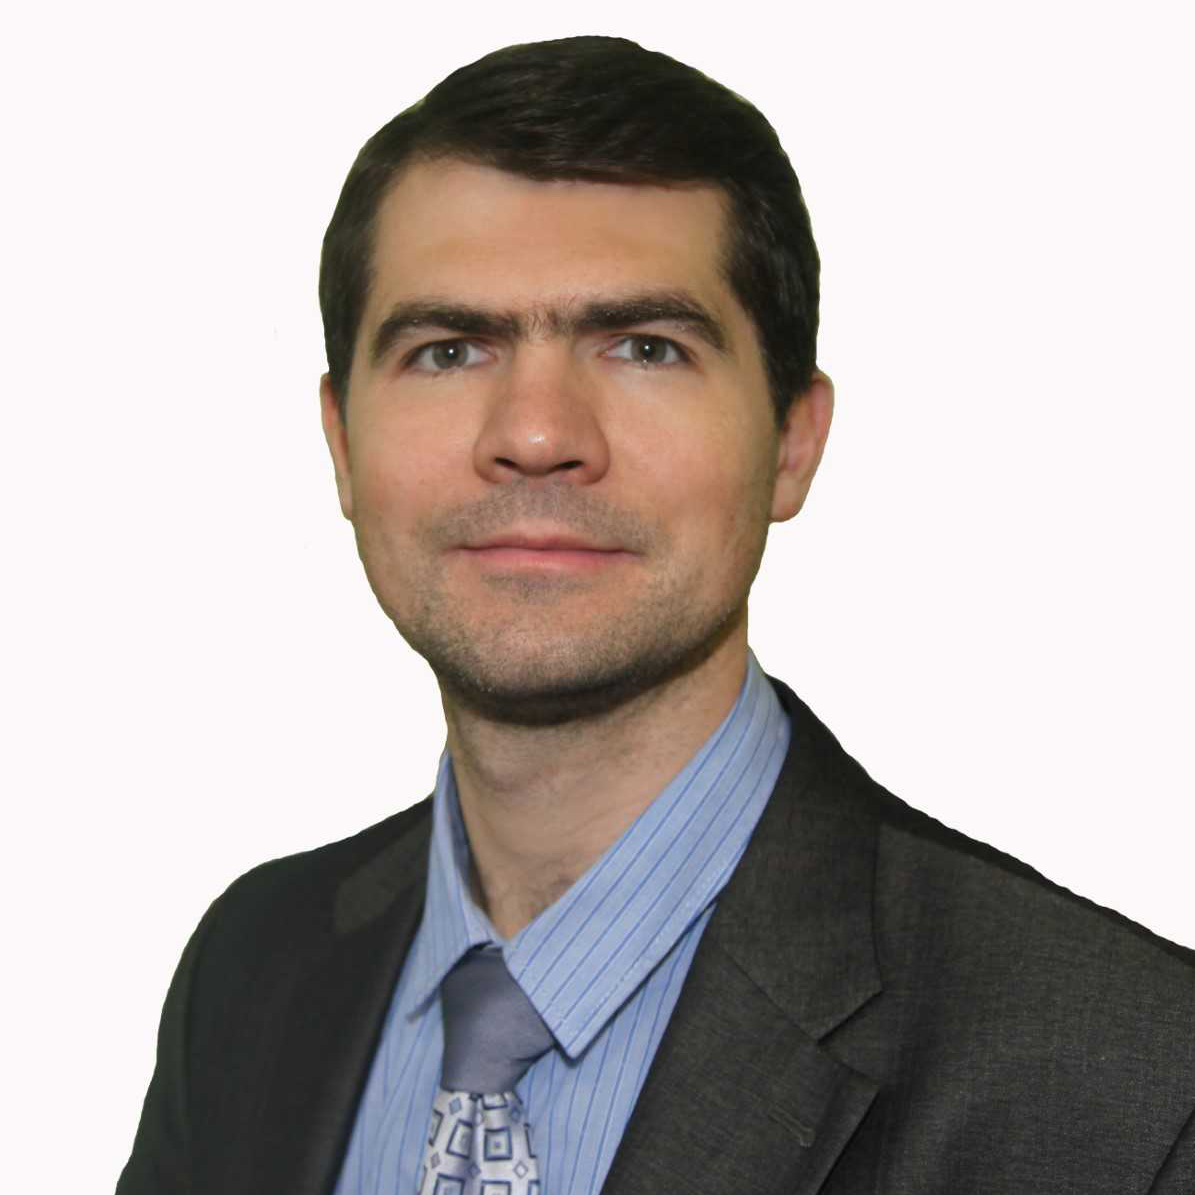 Саблин Андрей Борисович